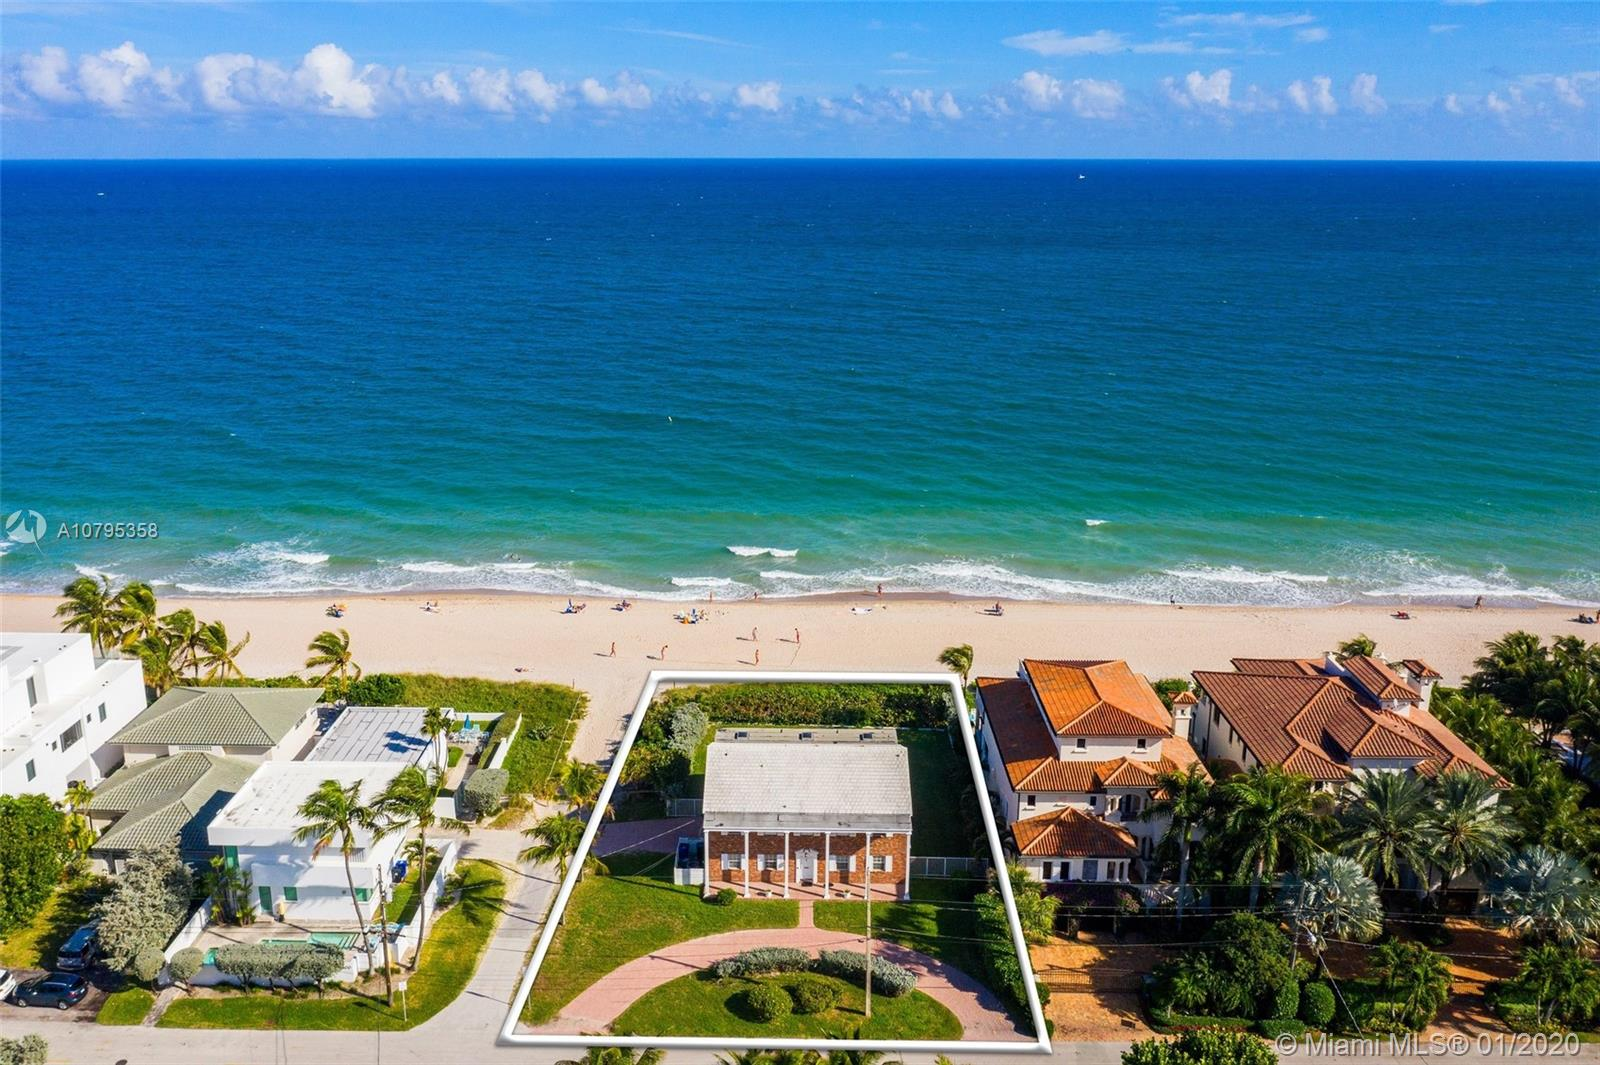 2424 N Atlantic Blvd Luxury Real Estate